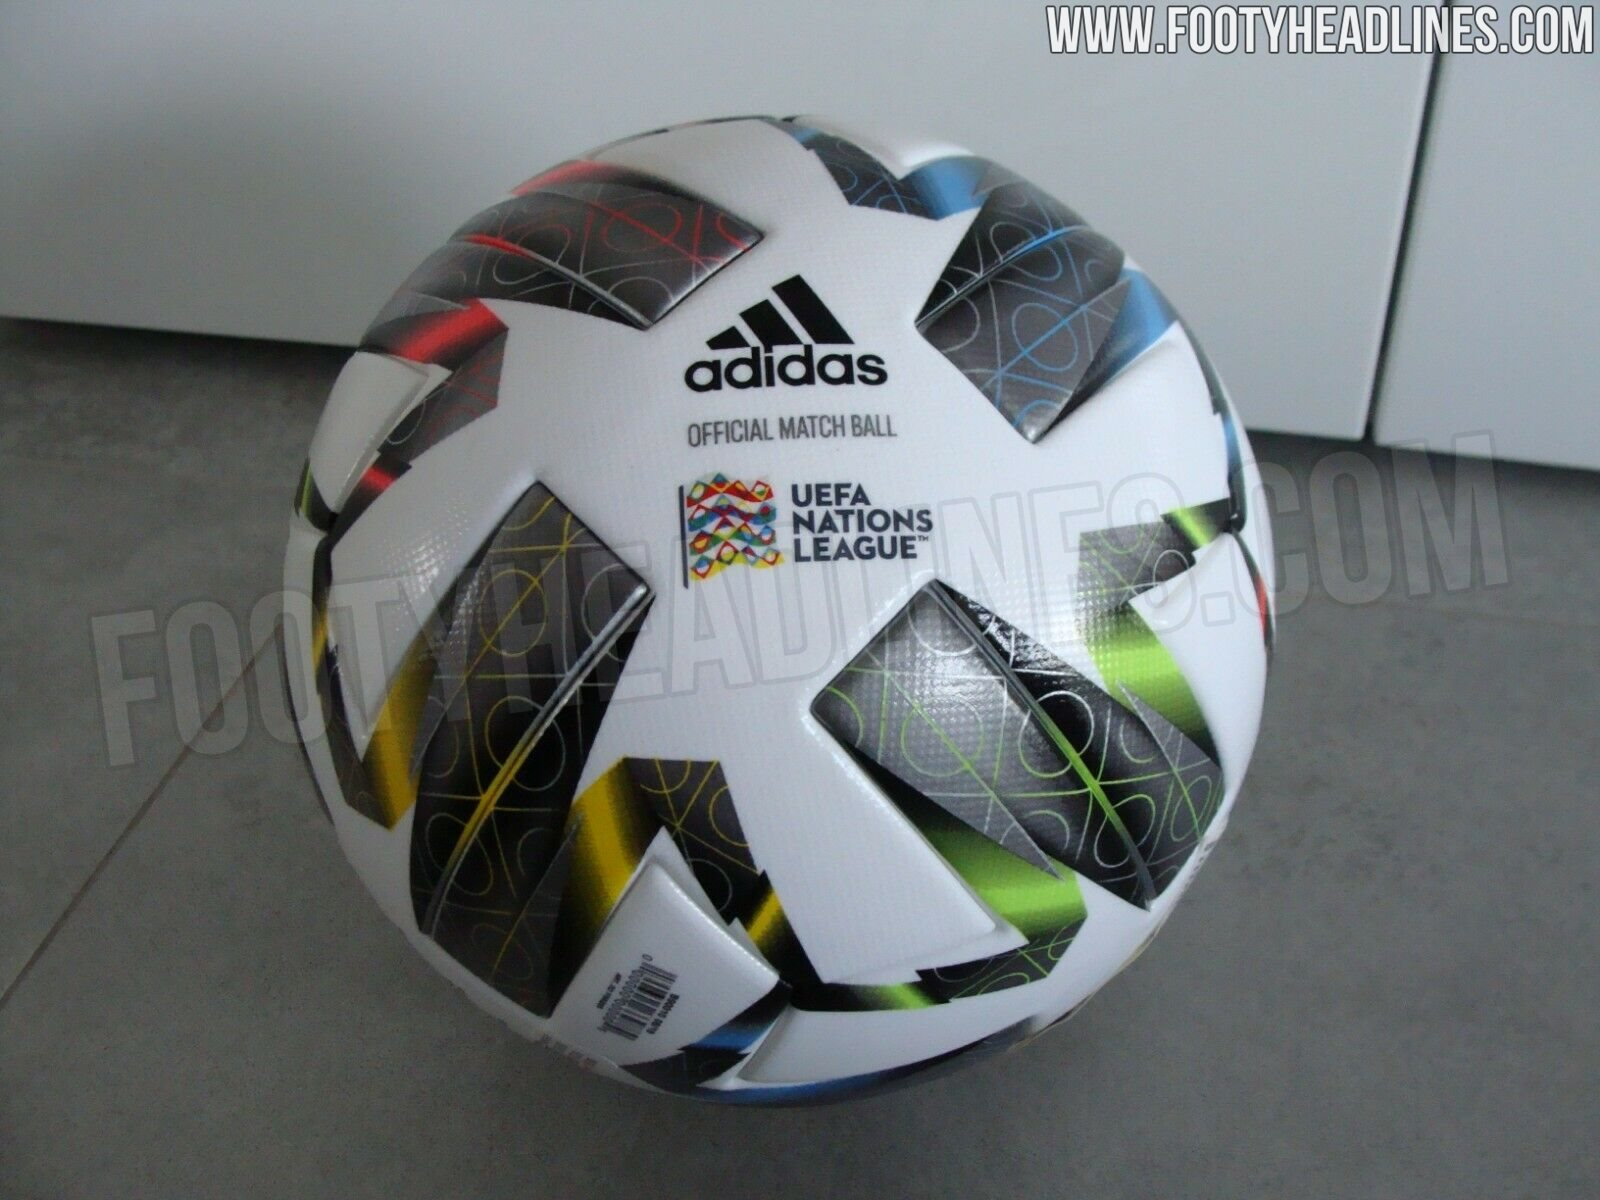 Adidas UEFA Nations League 2020-2021 Ball Leaked - Footy ...